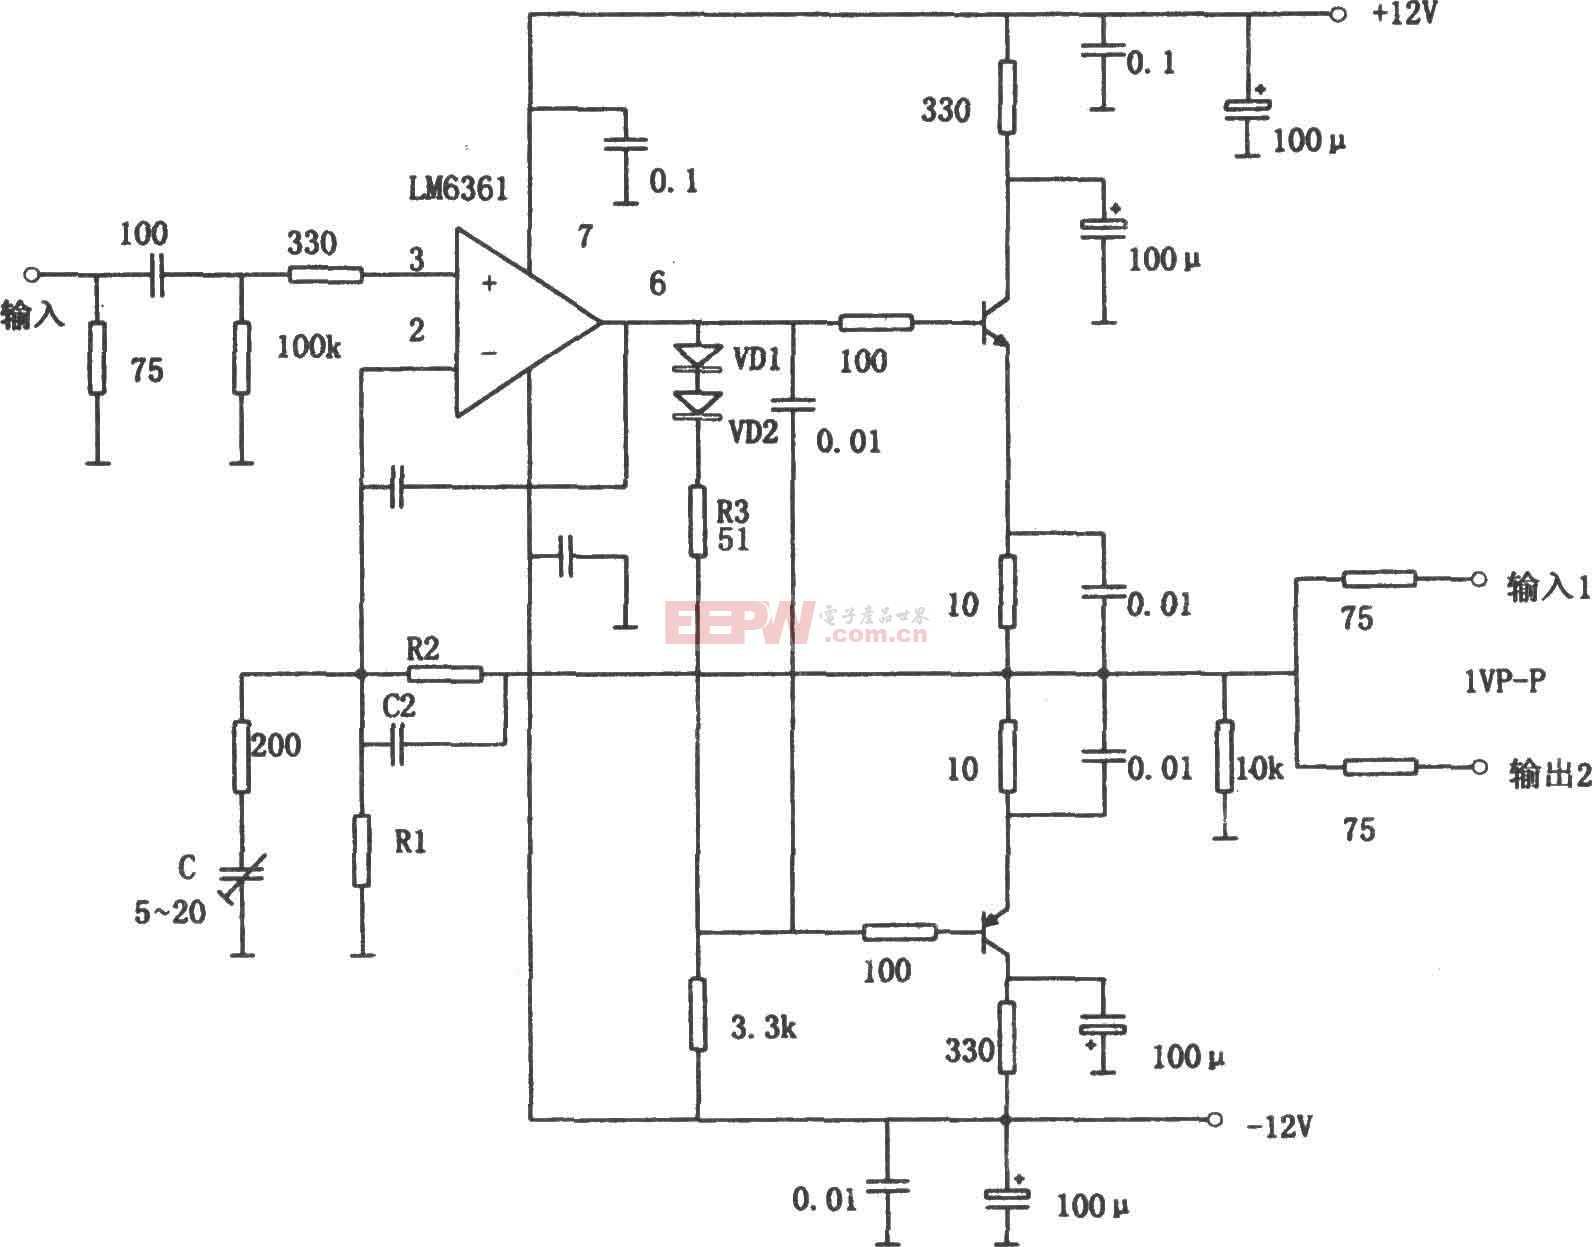 LM6361构成的用于容性负载的宽带驱动器电路图